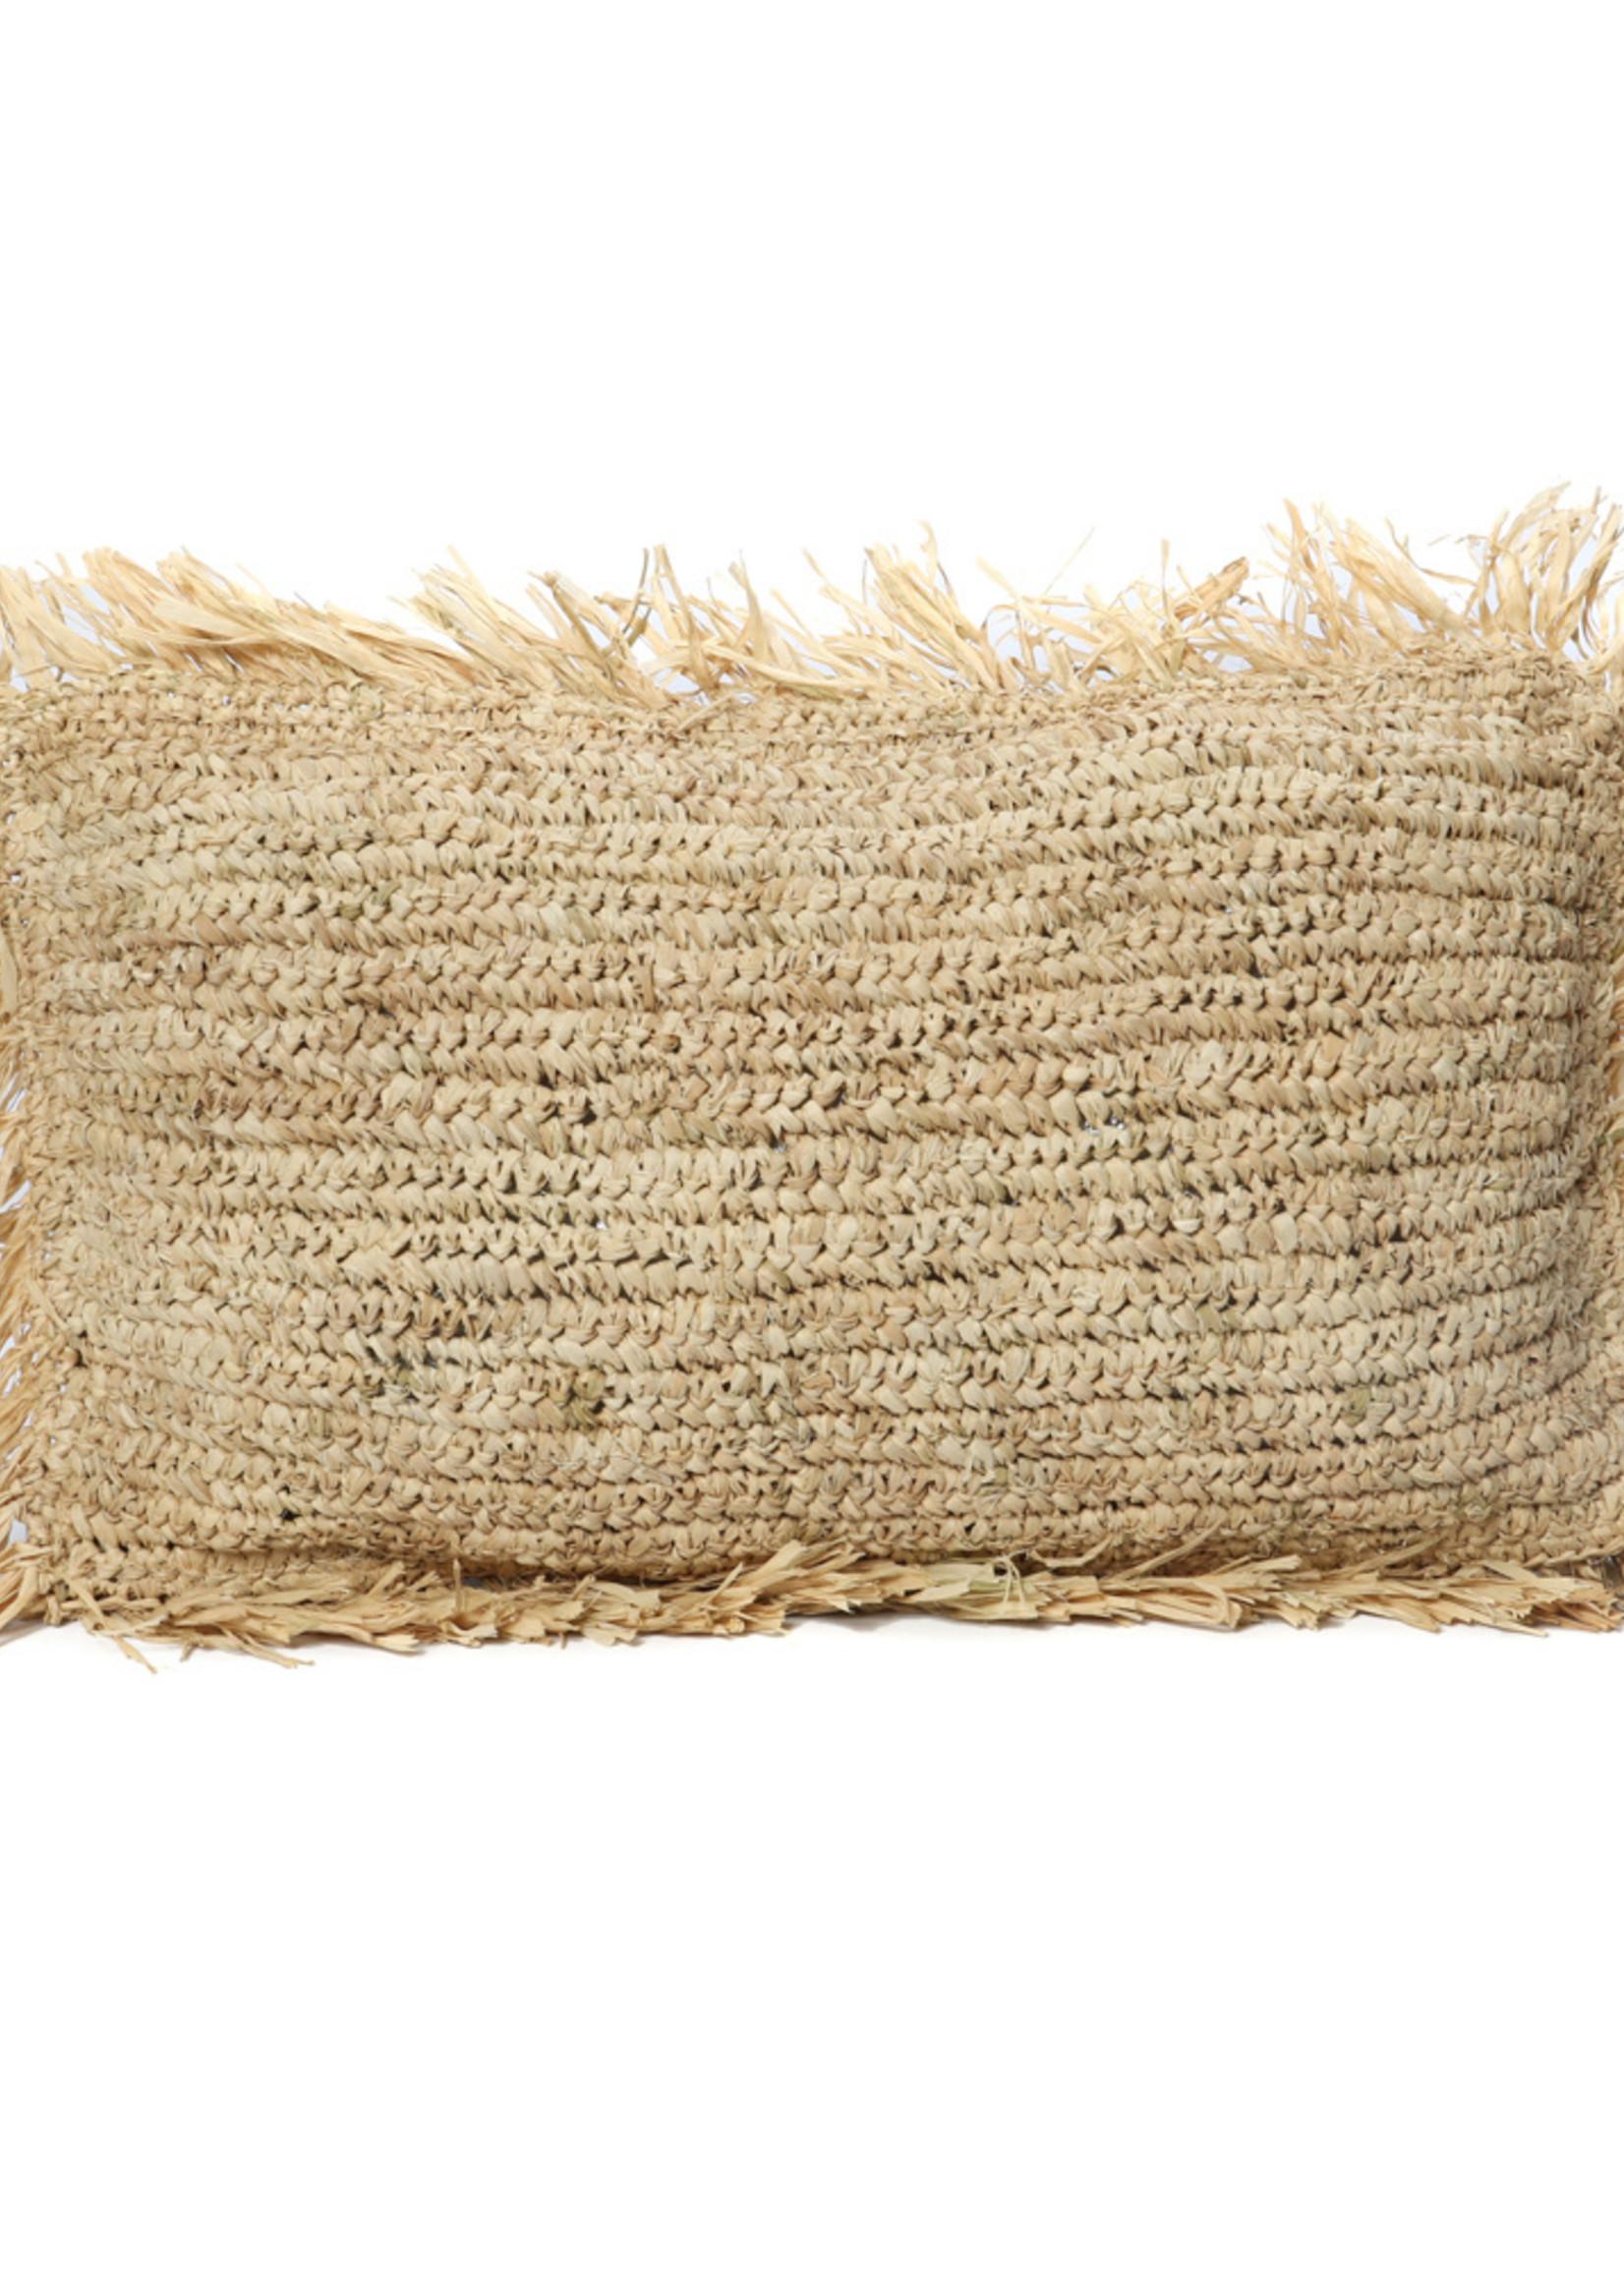 The Raffia Cushion Rectangular - Natural